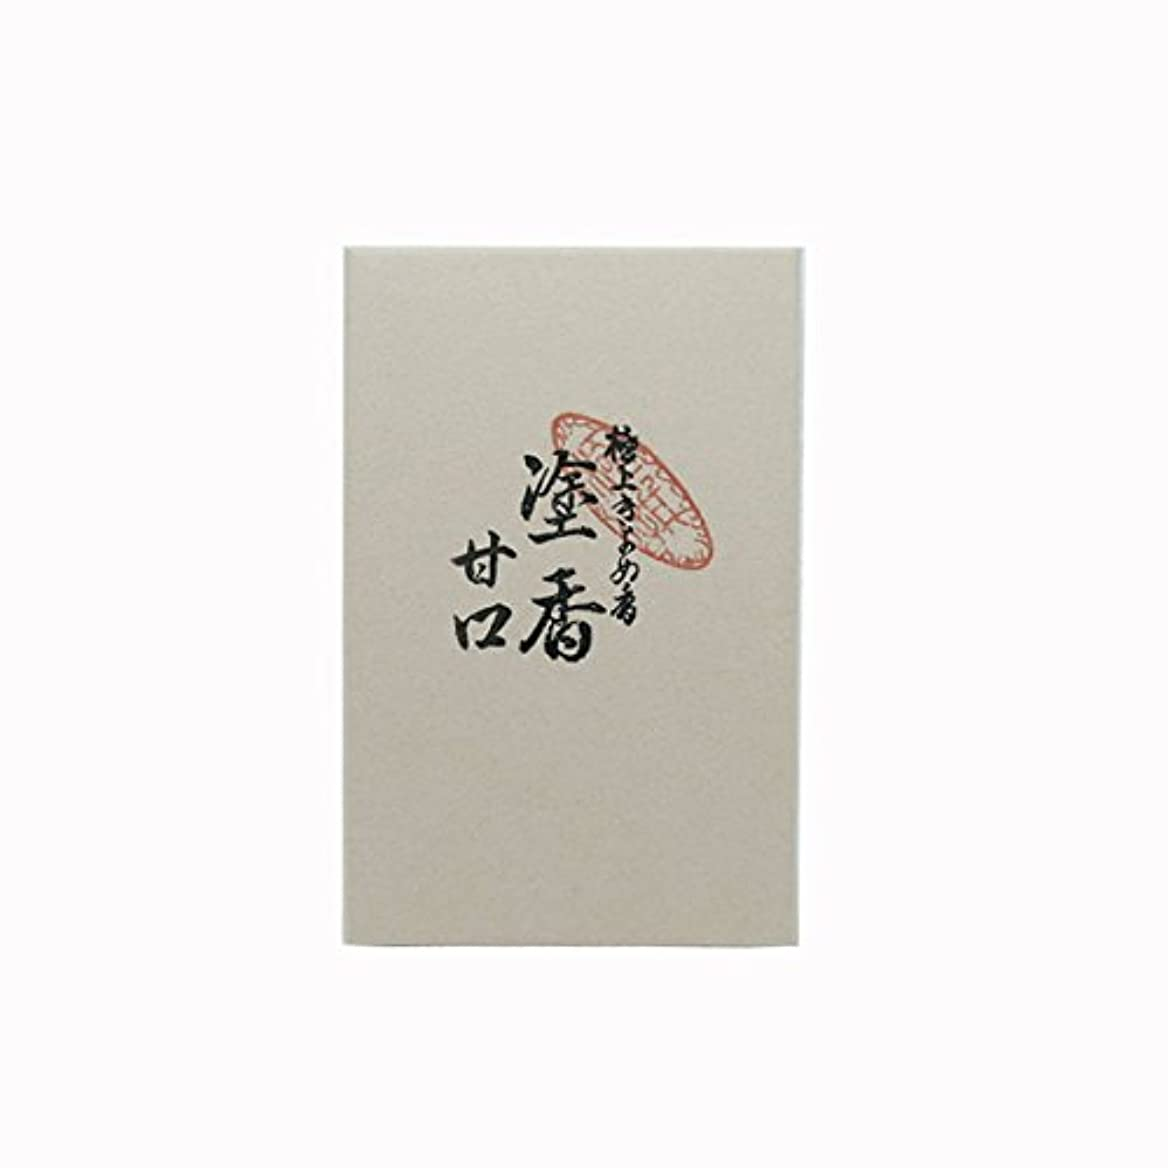 合法合図叱る塗香(甘口) 12g入